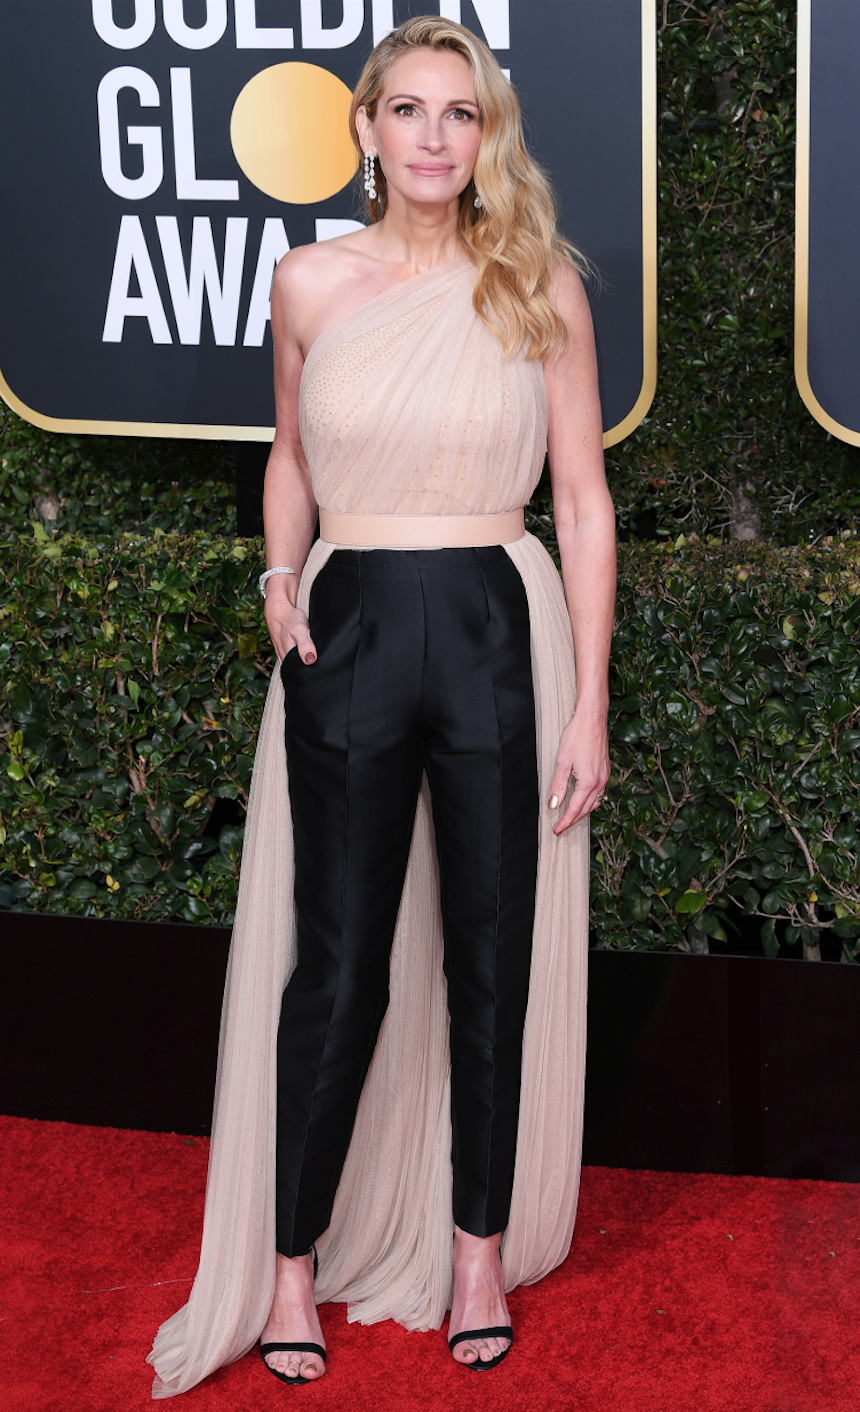 2019 Golden Globes Red Carpet Fashion Recap Alg Style